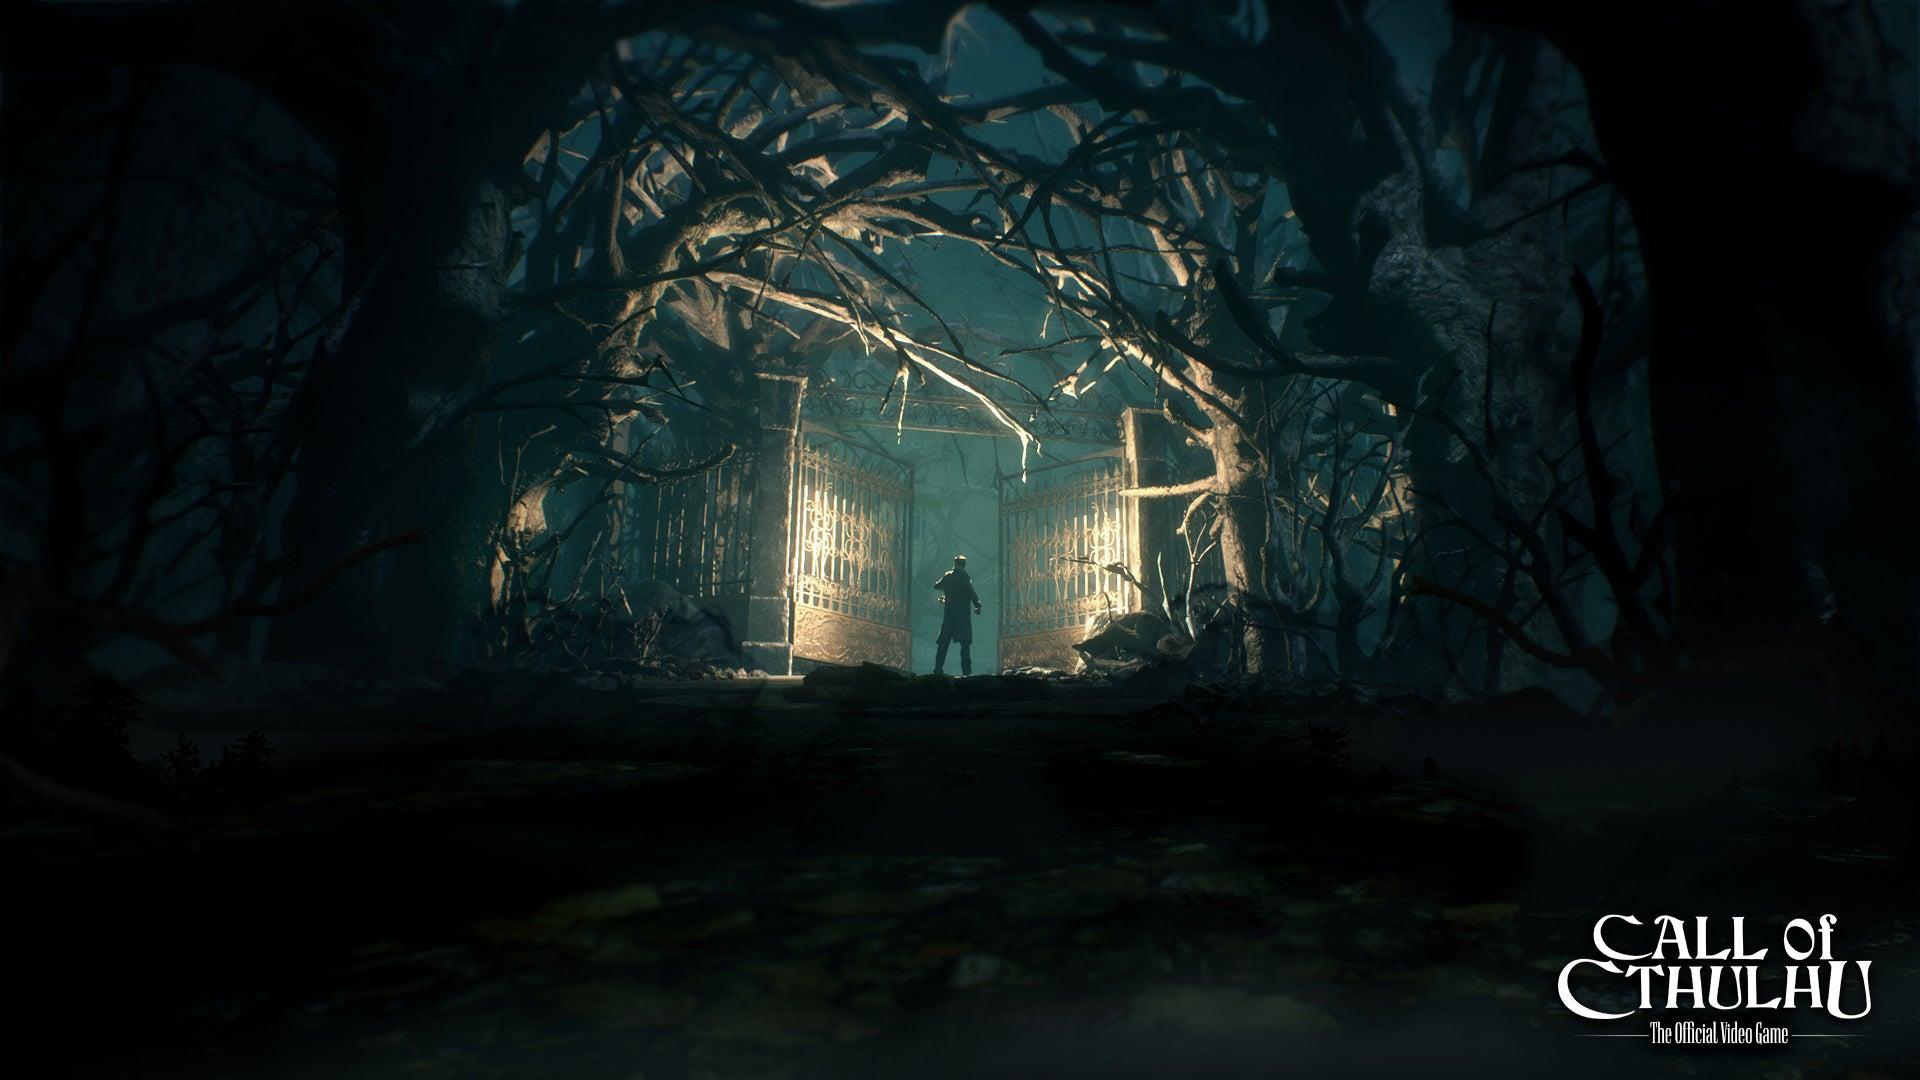 Image for Call of Cthulhu screenshots reveal creepy Darkwater Island